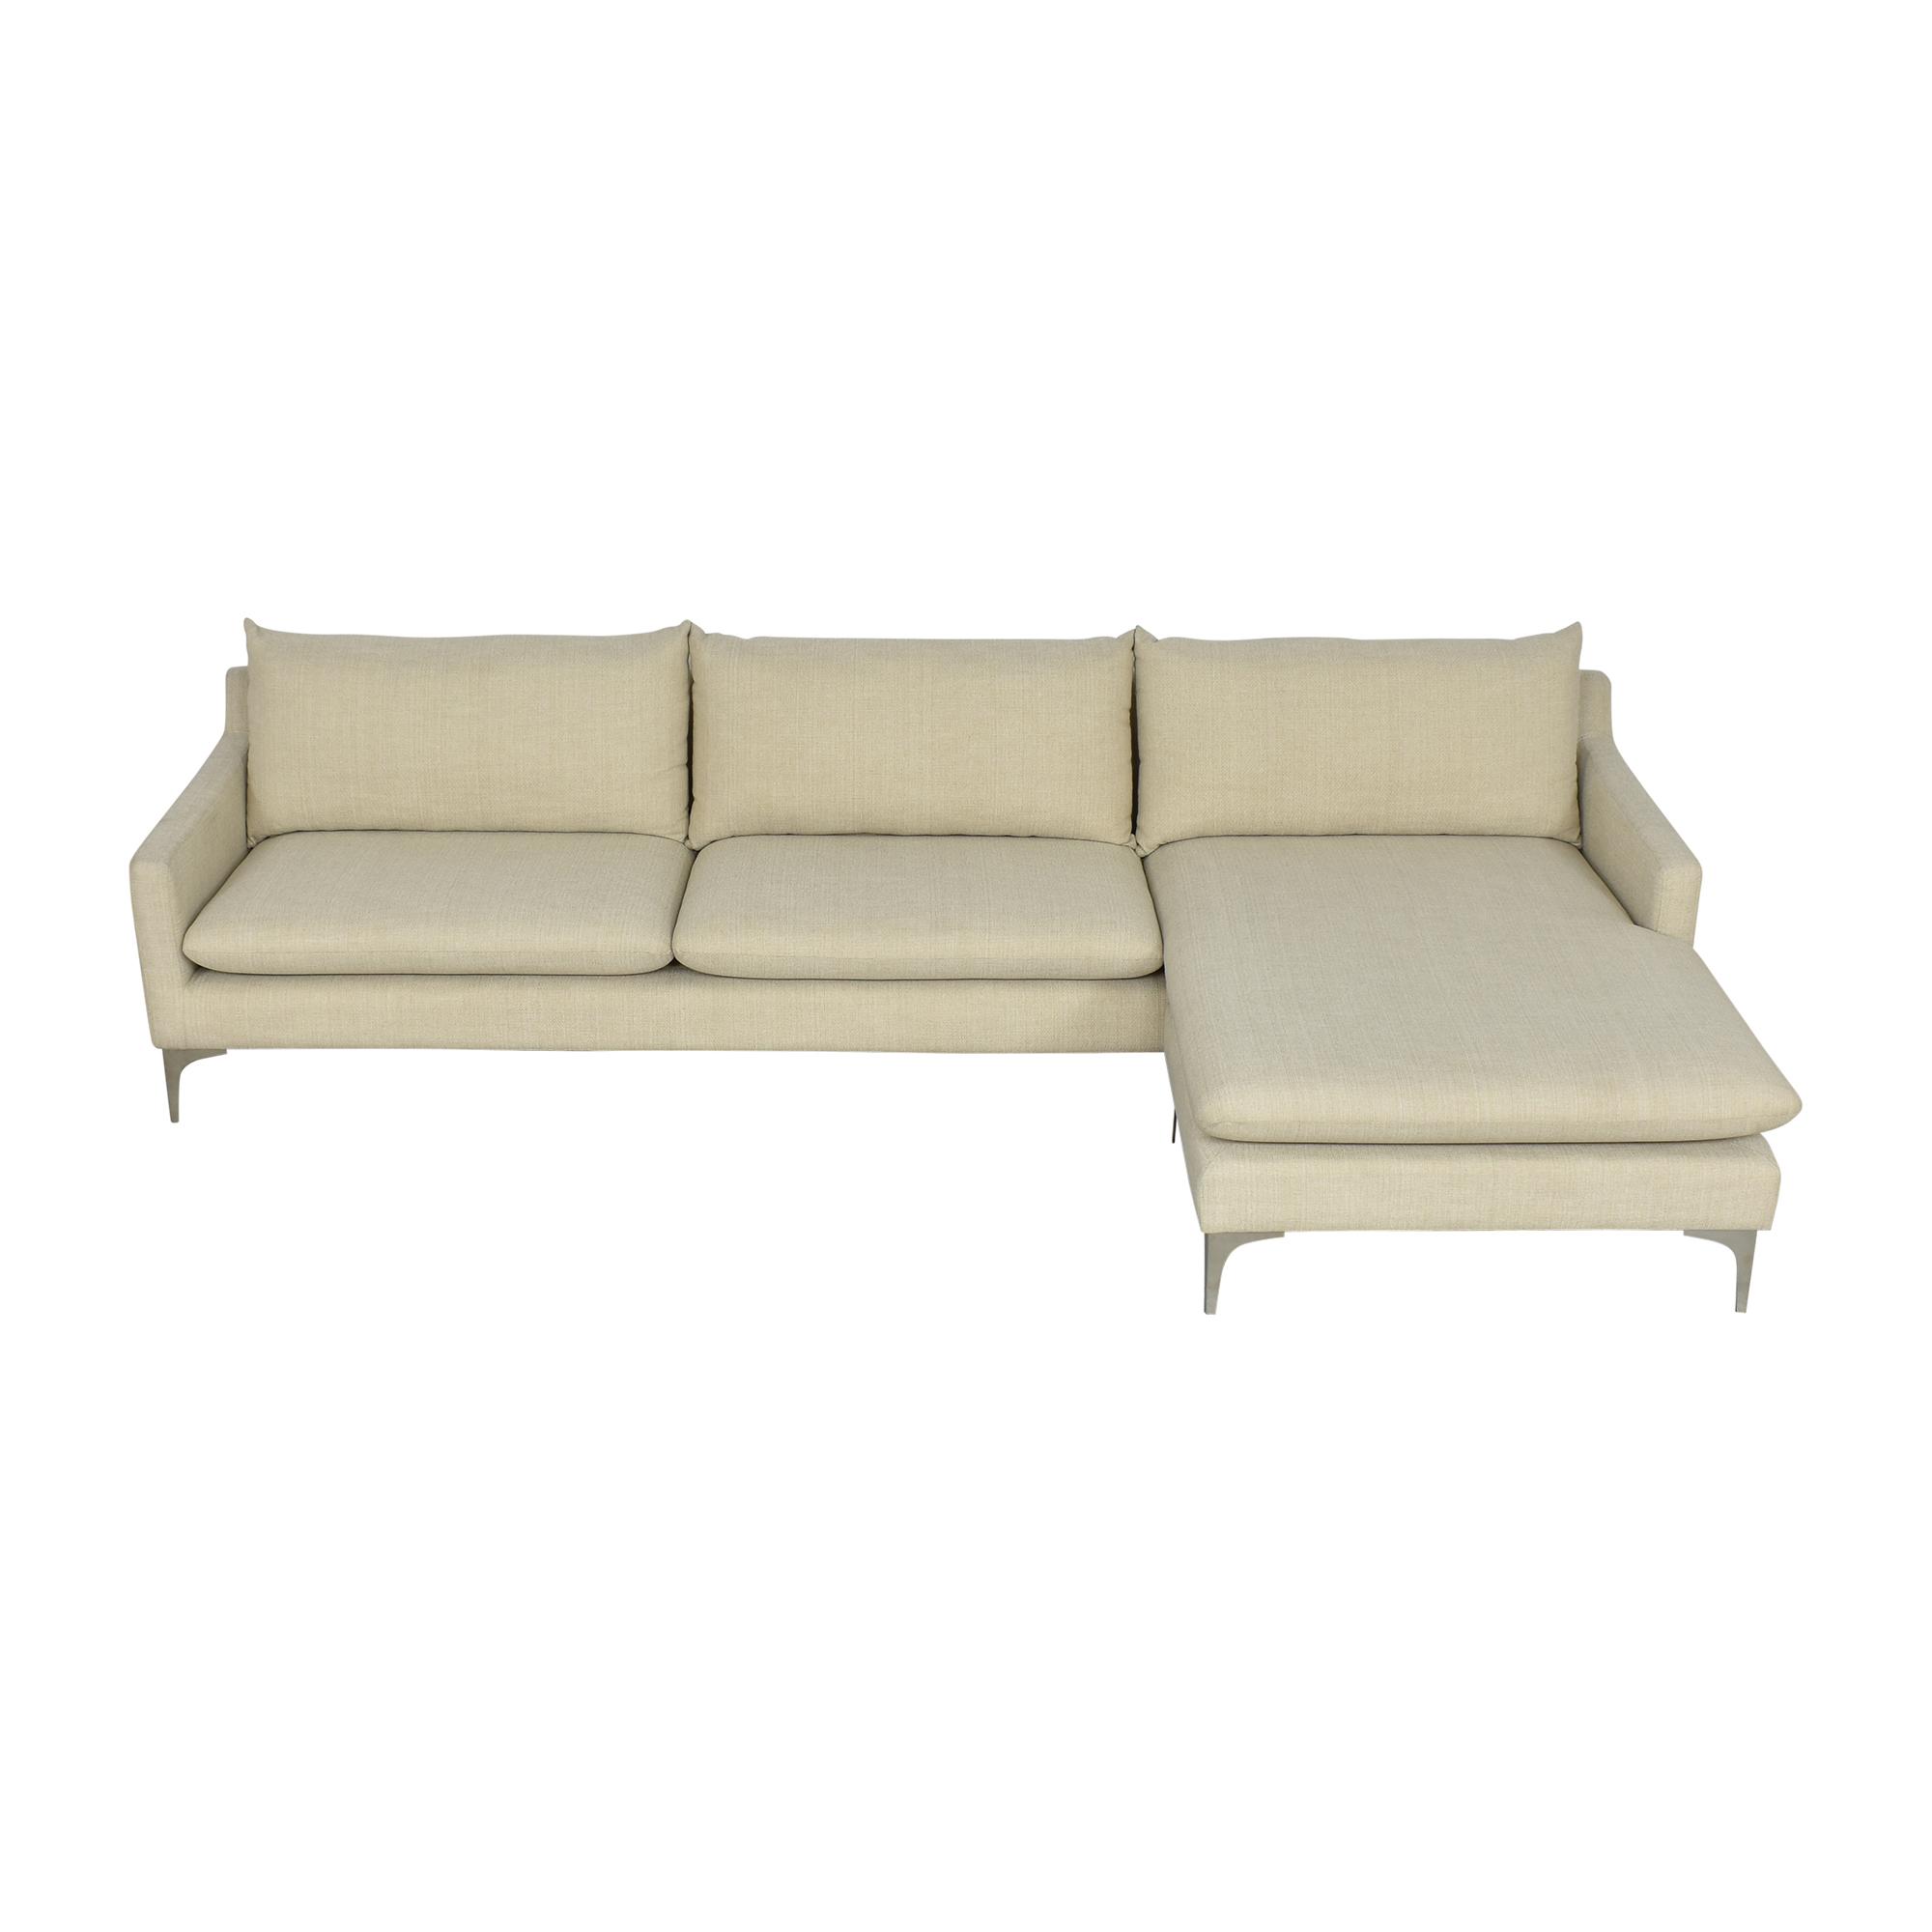 Nuevo Nuevo Anders Sectional Sofa on sale